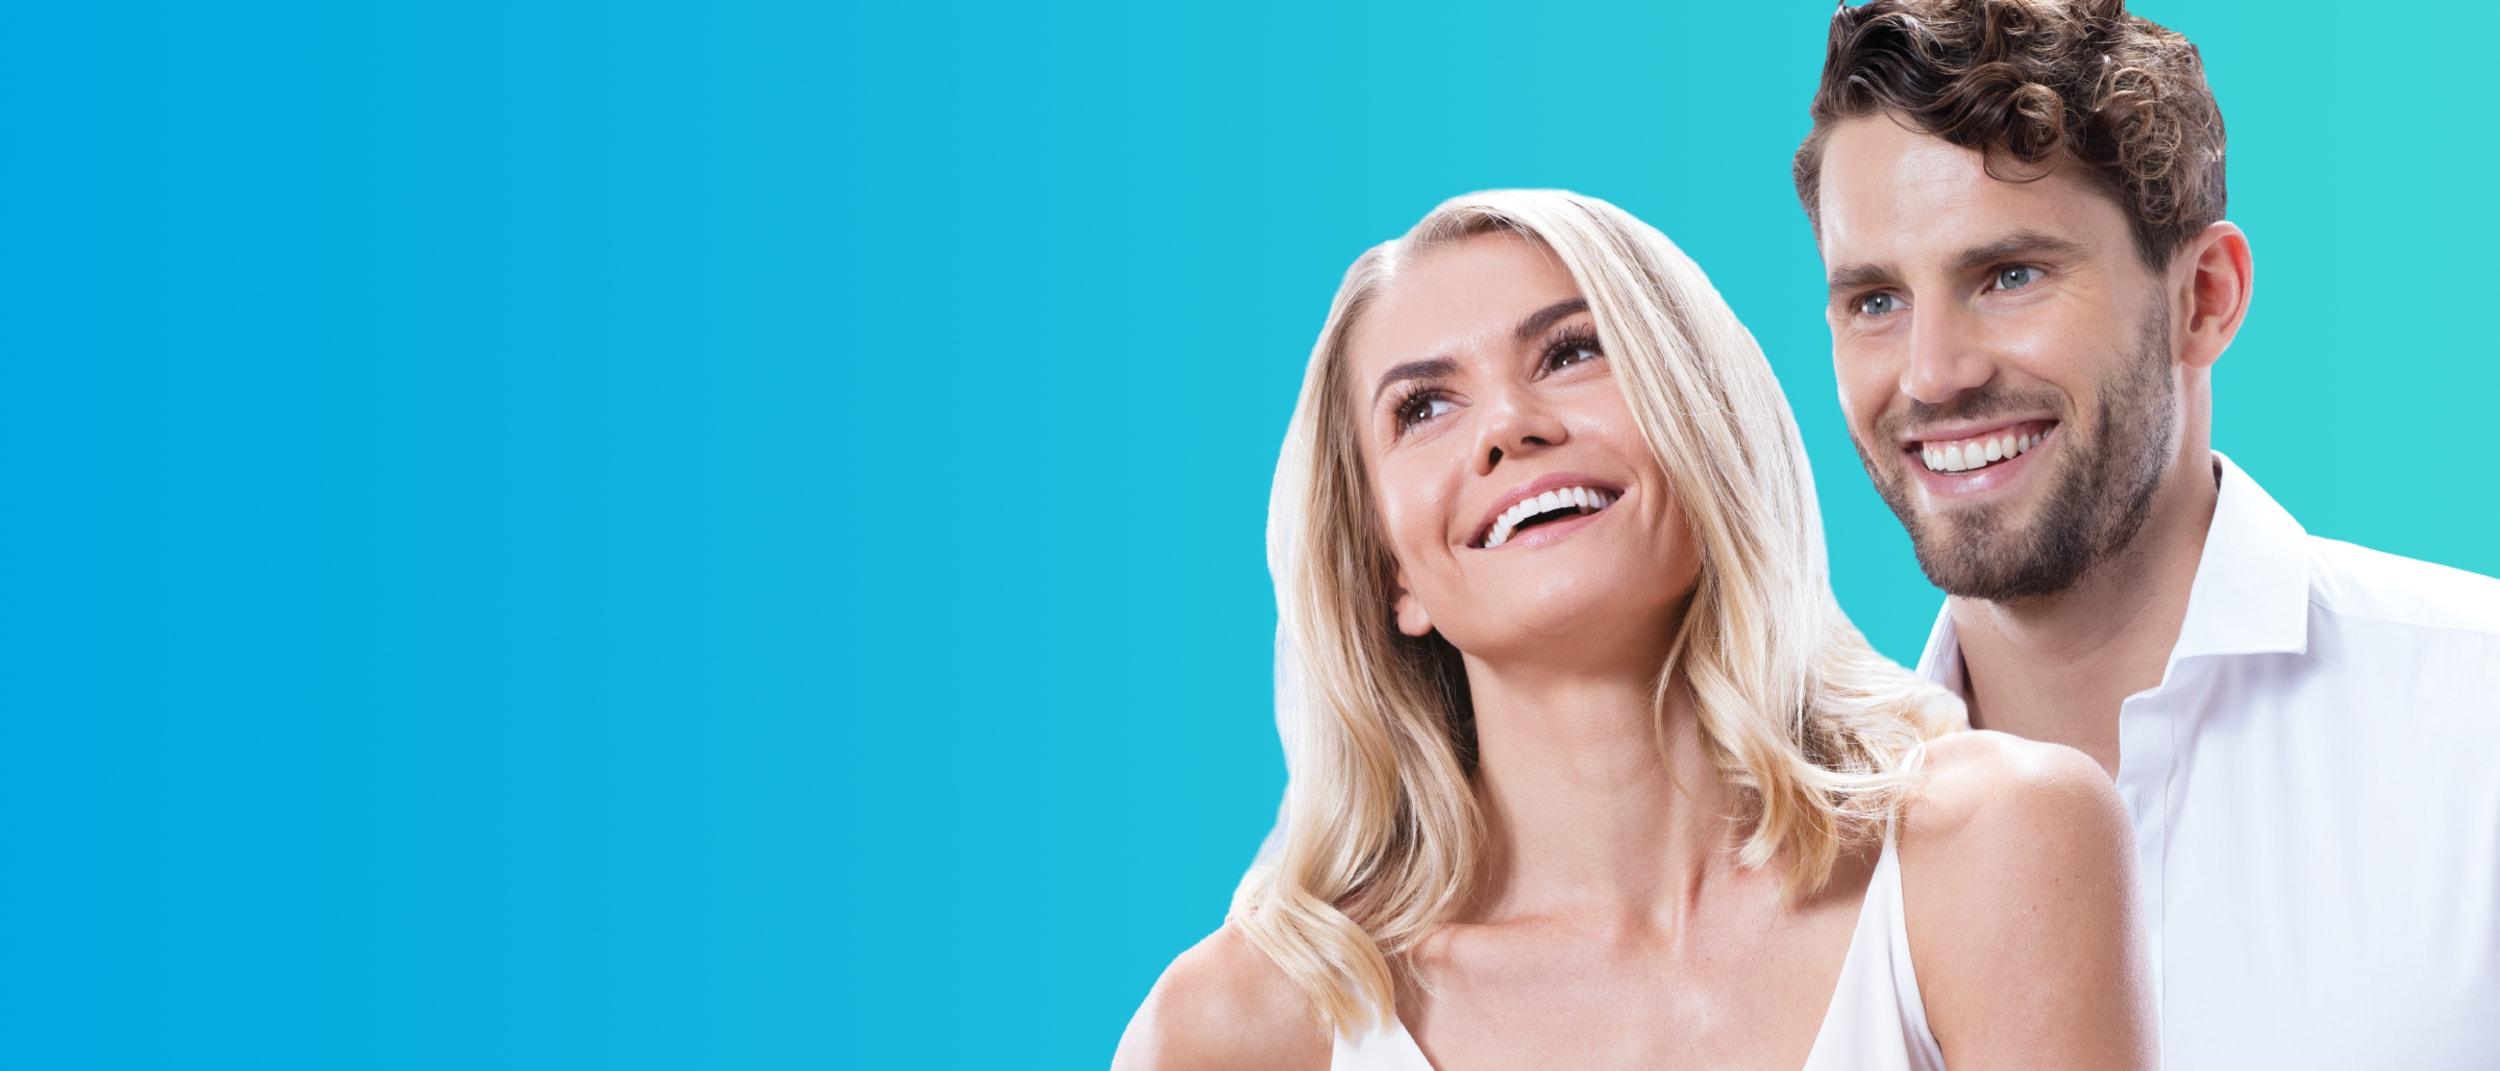 Australian Skin Clinics: 40% off